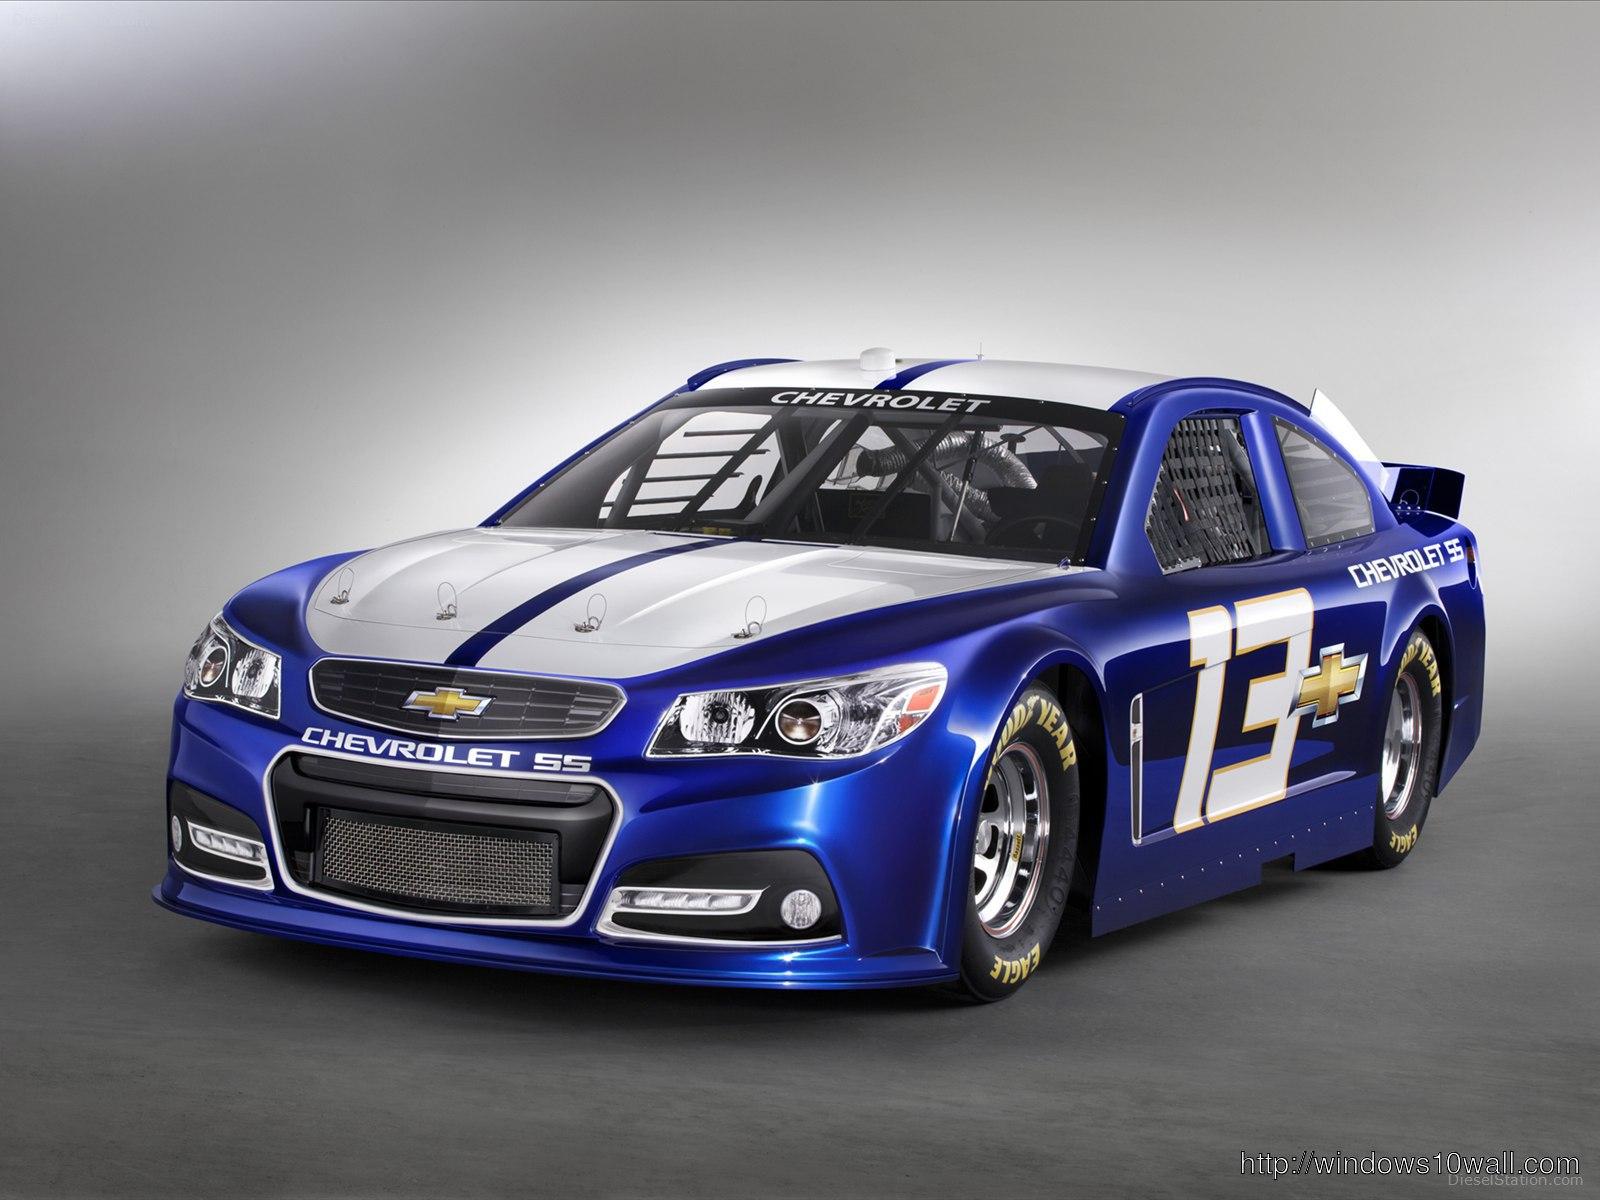 2013 Chevrolet SS NASCAR Race Car Background Wallpaper